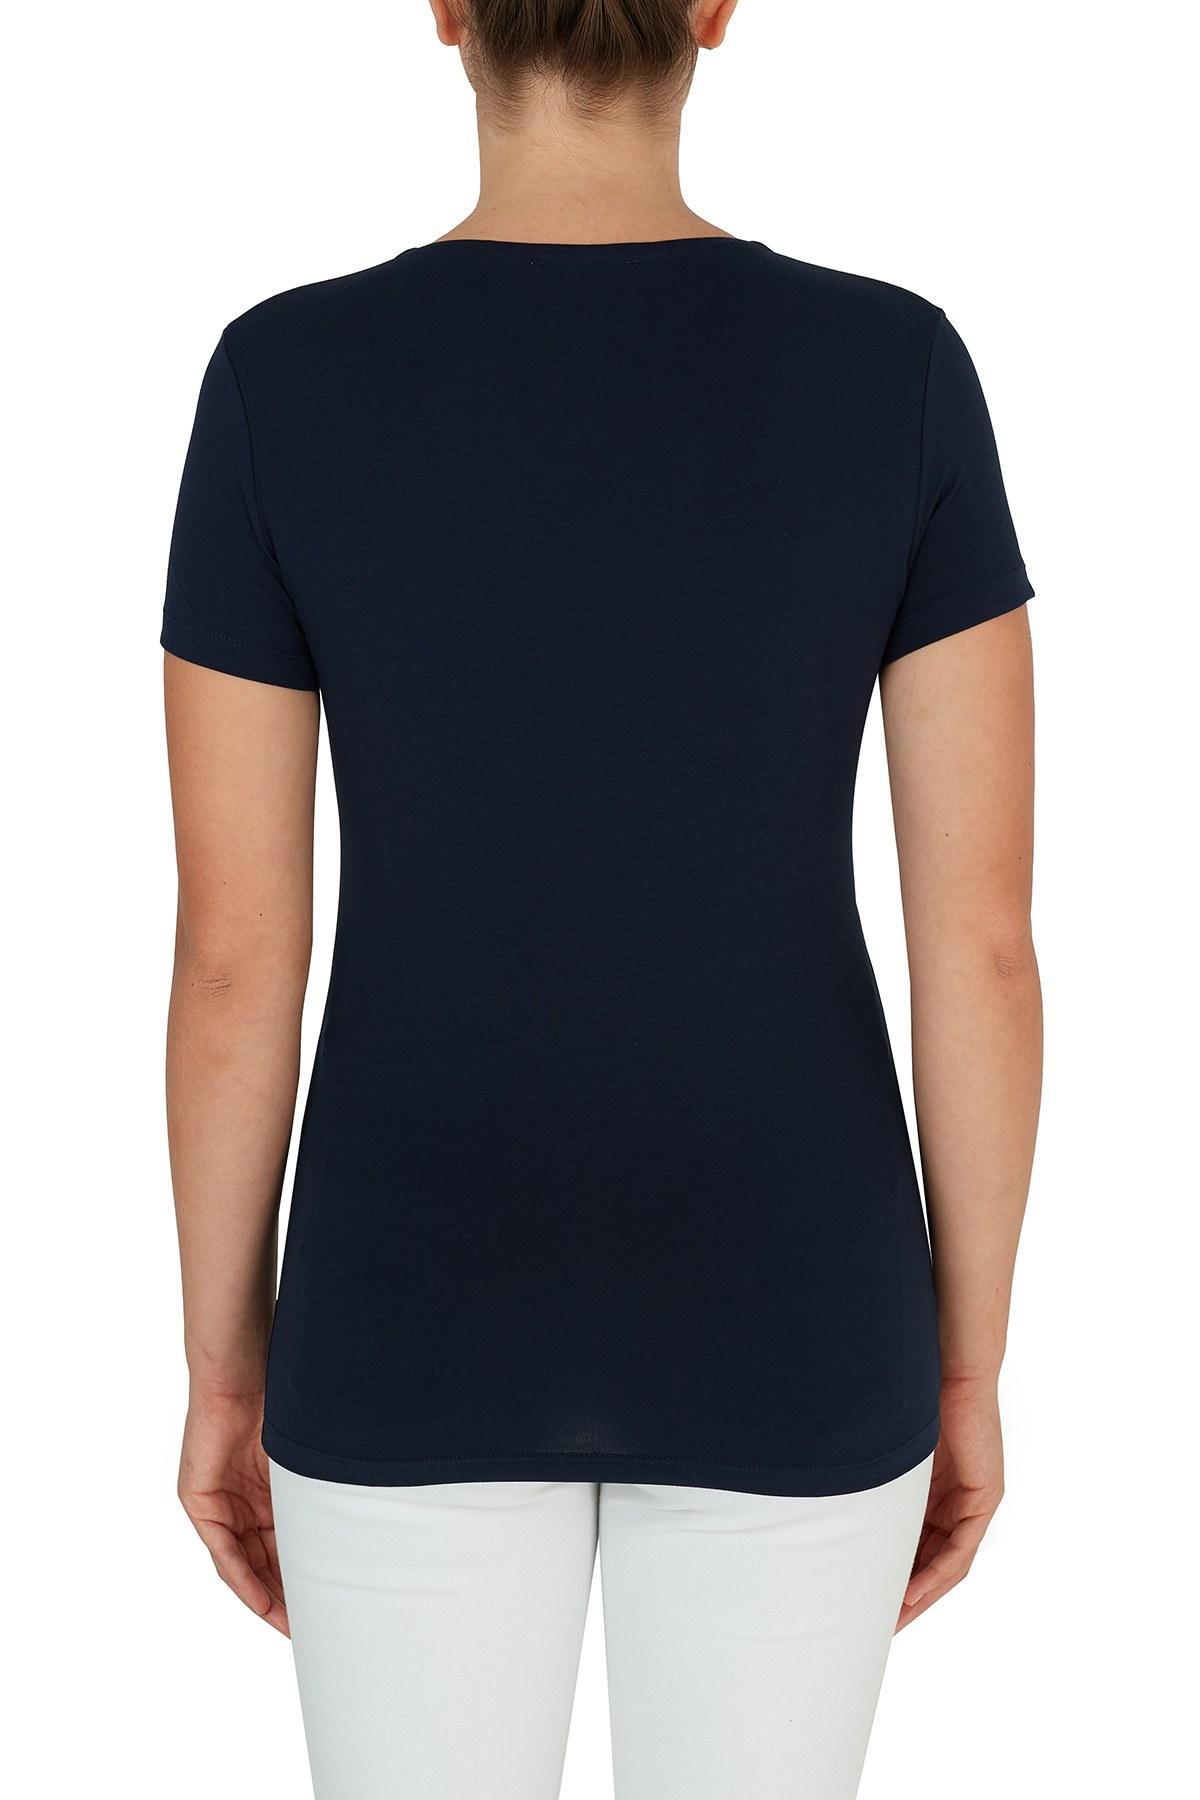 Lacoste V Yaka Pamuklu Kadın T Shirt TF0999 166 LACİVERT